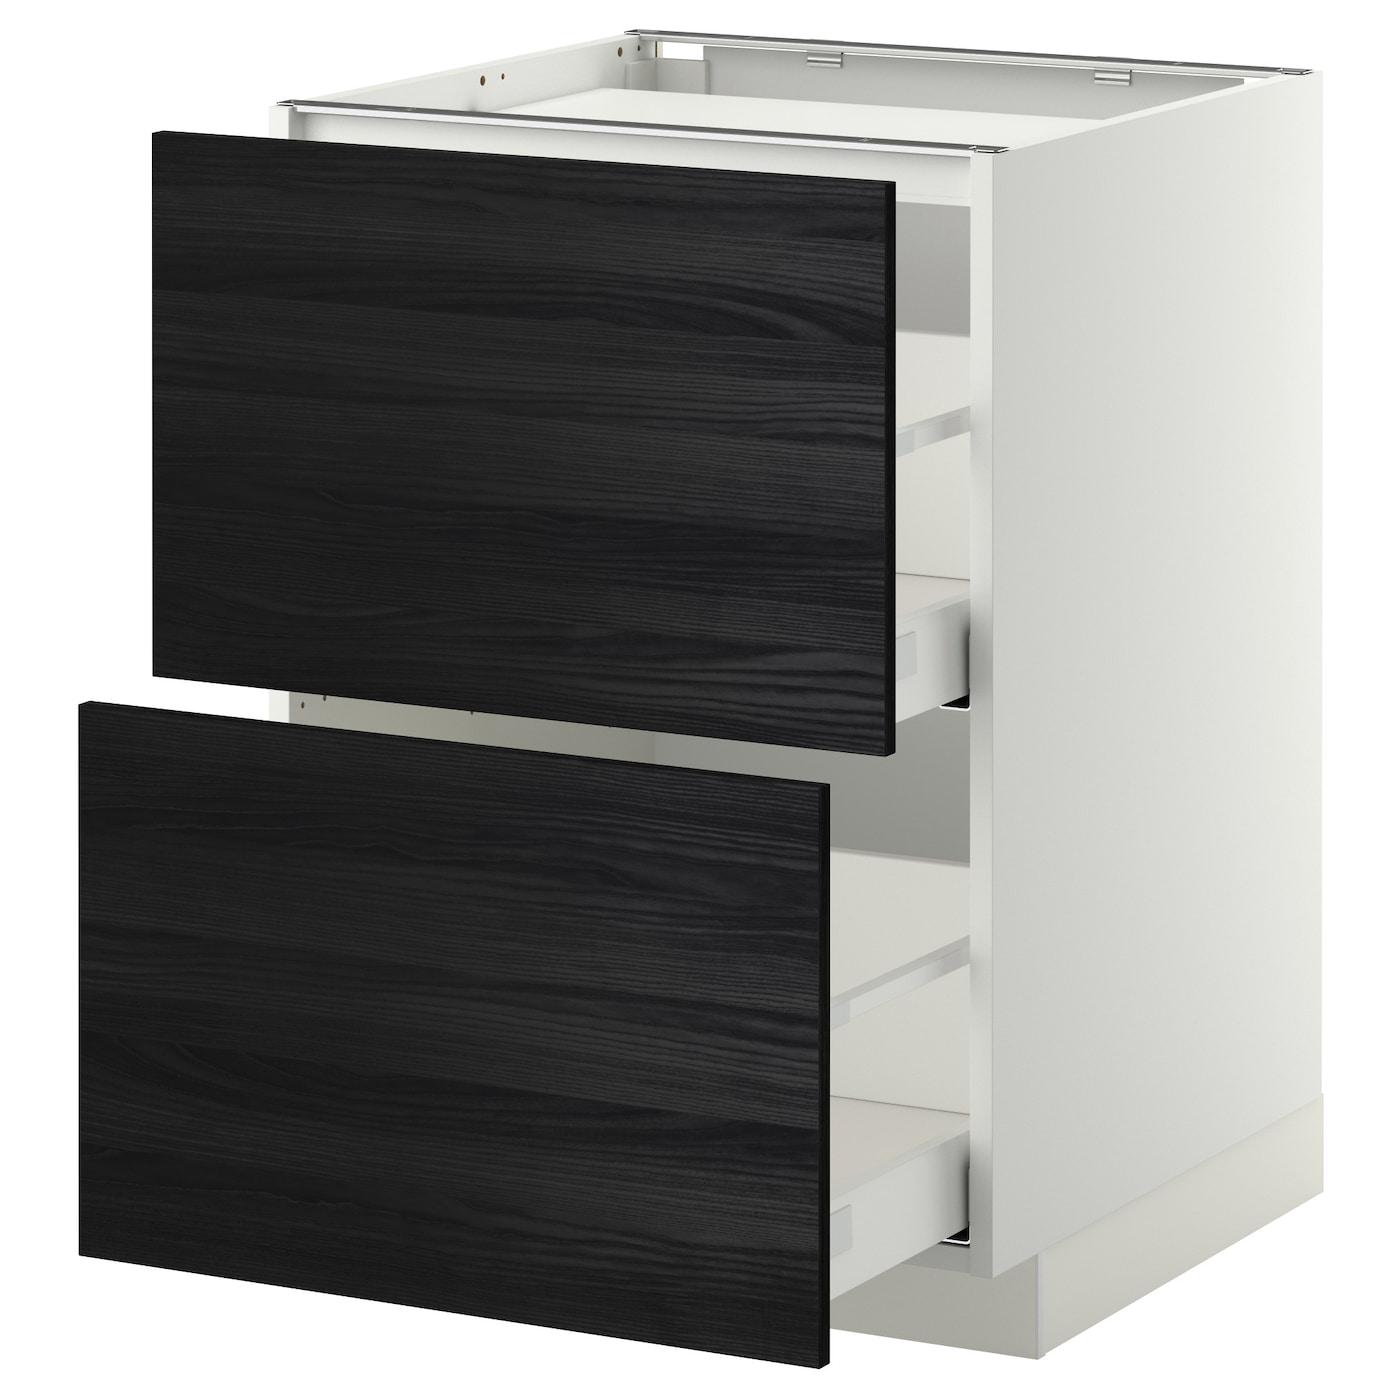 Ikea Kitchen Tingsryd: METOD/MAXIMERA Base Cab F Hob/2 Fronts/2 Drawers White